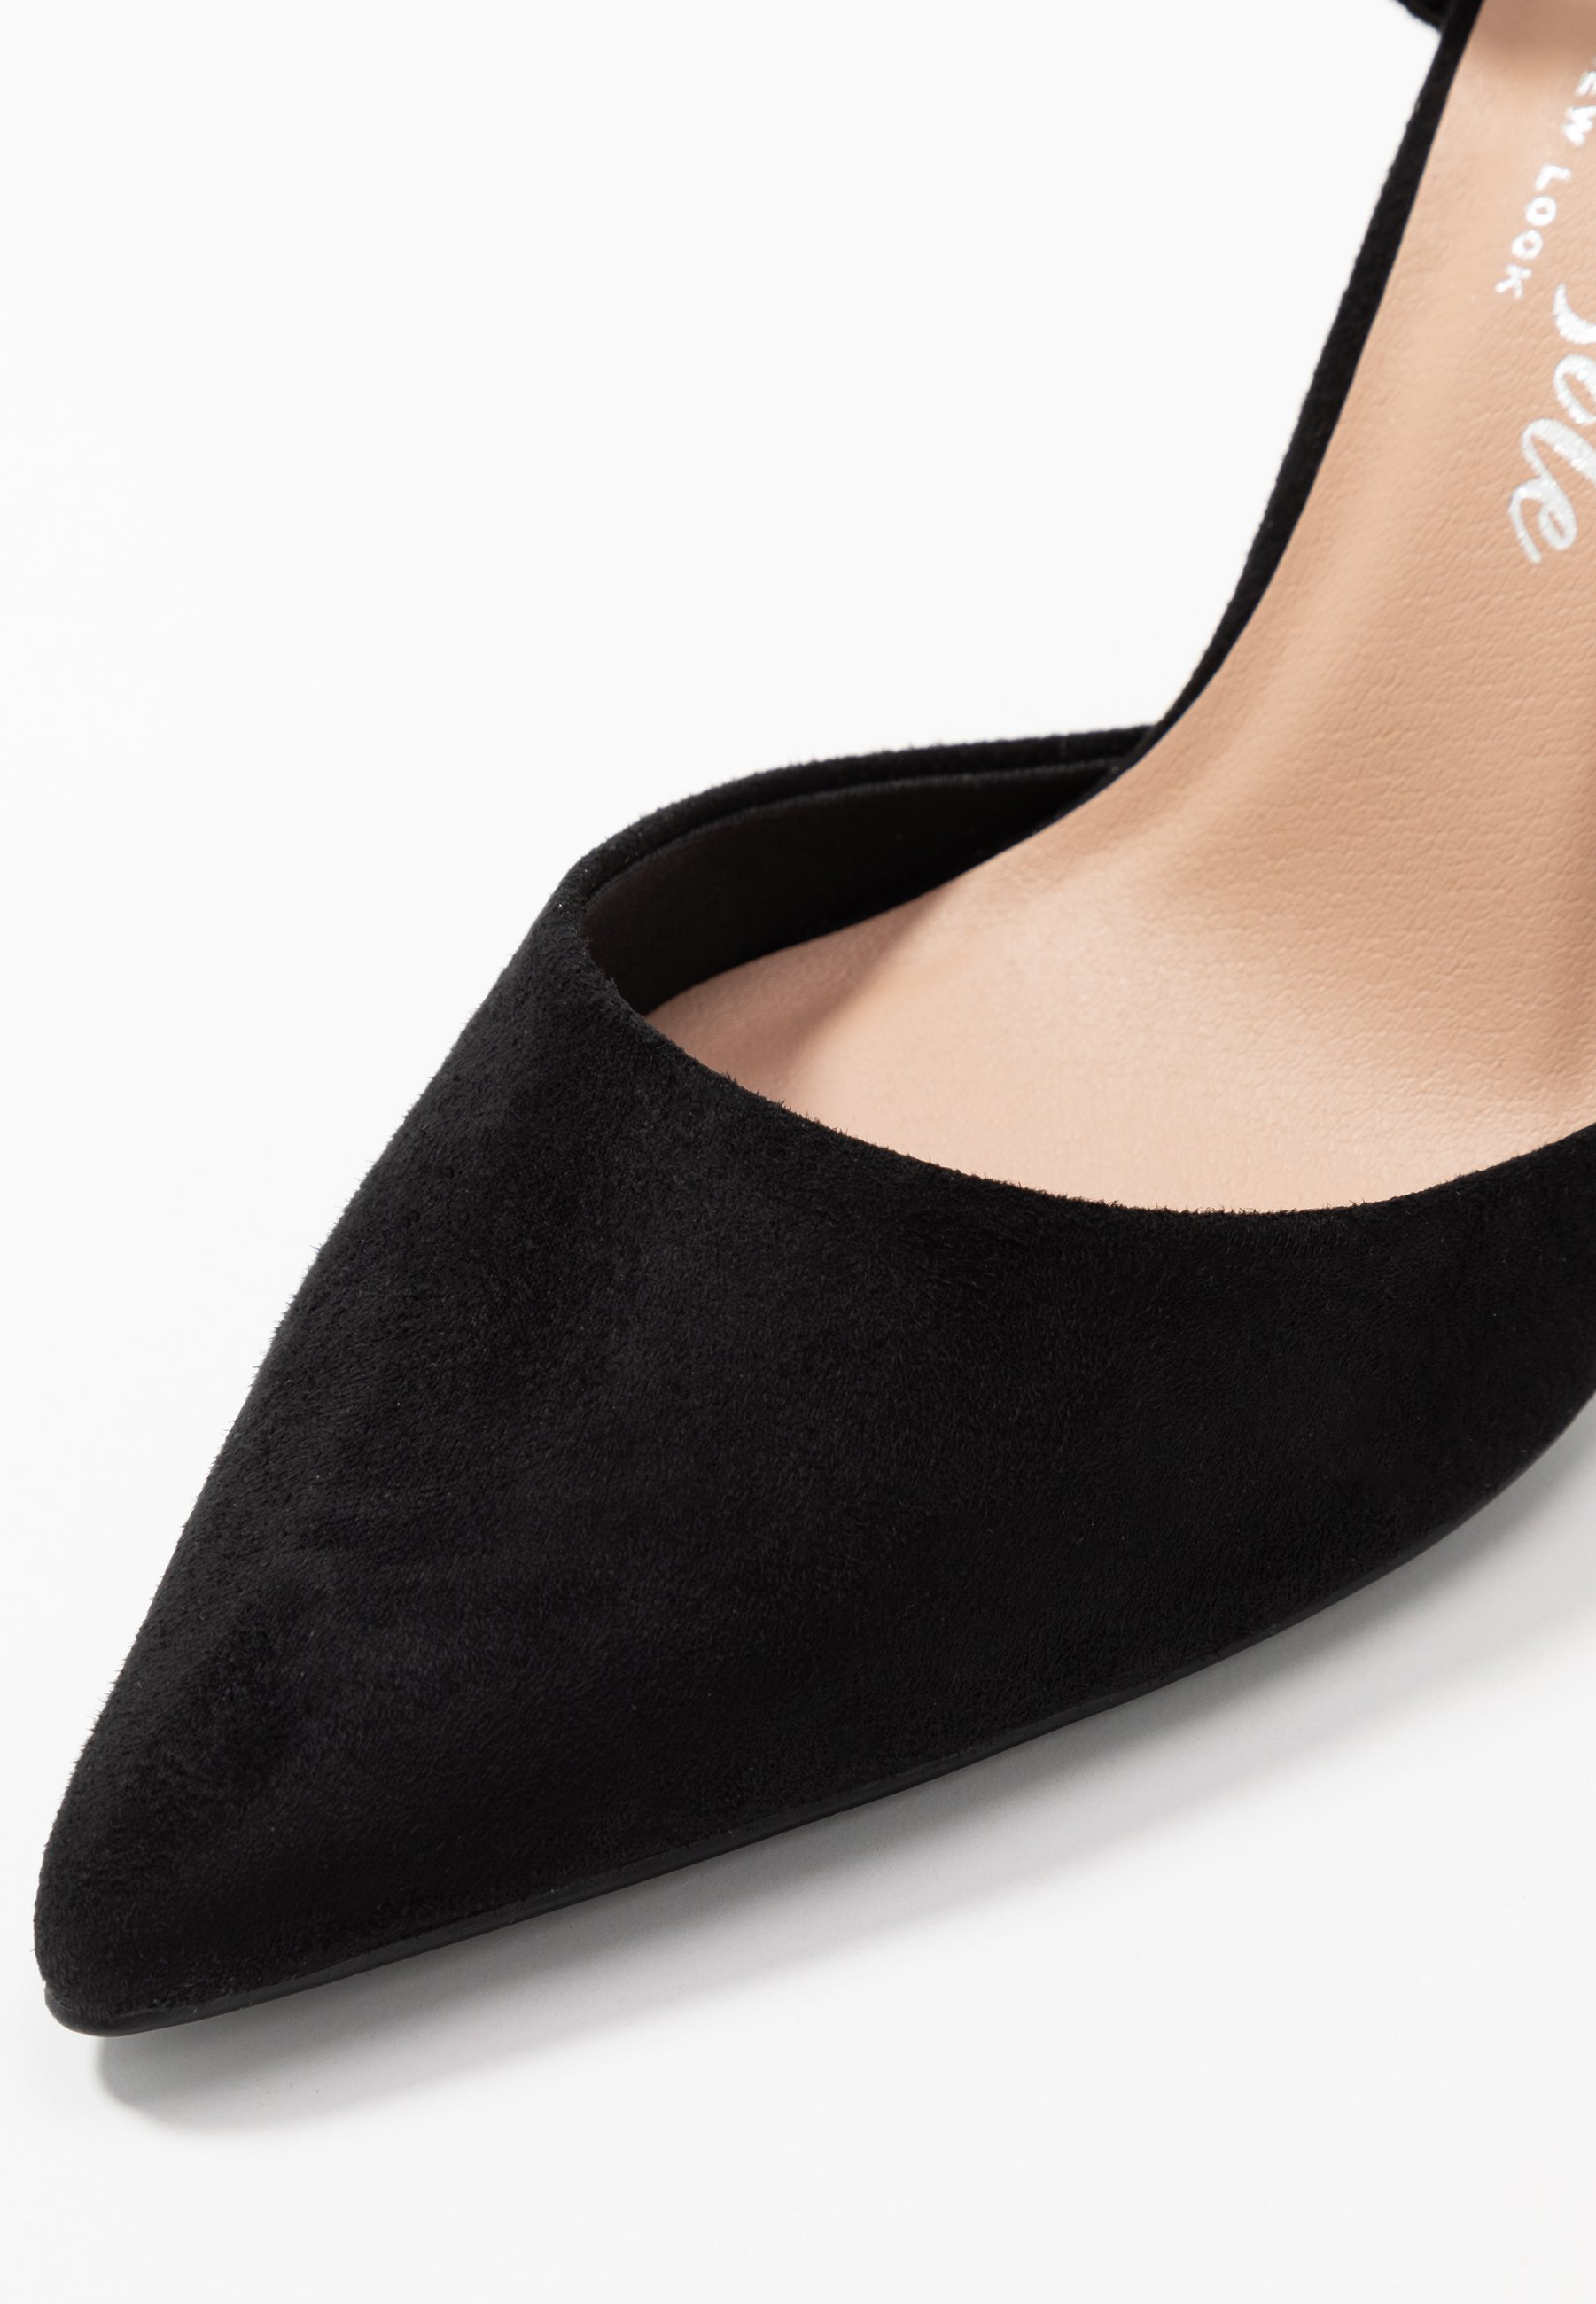 Oferta Obuwie damskie New Look RISE Szpilki black